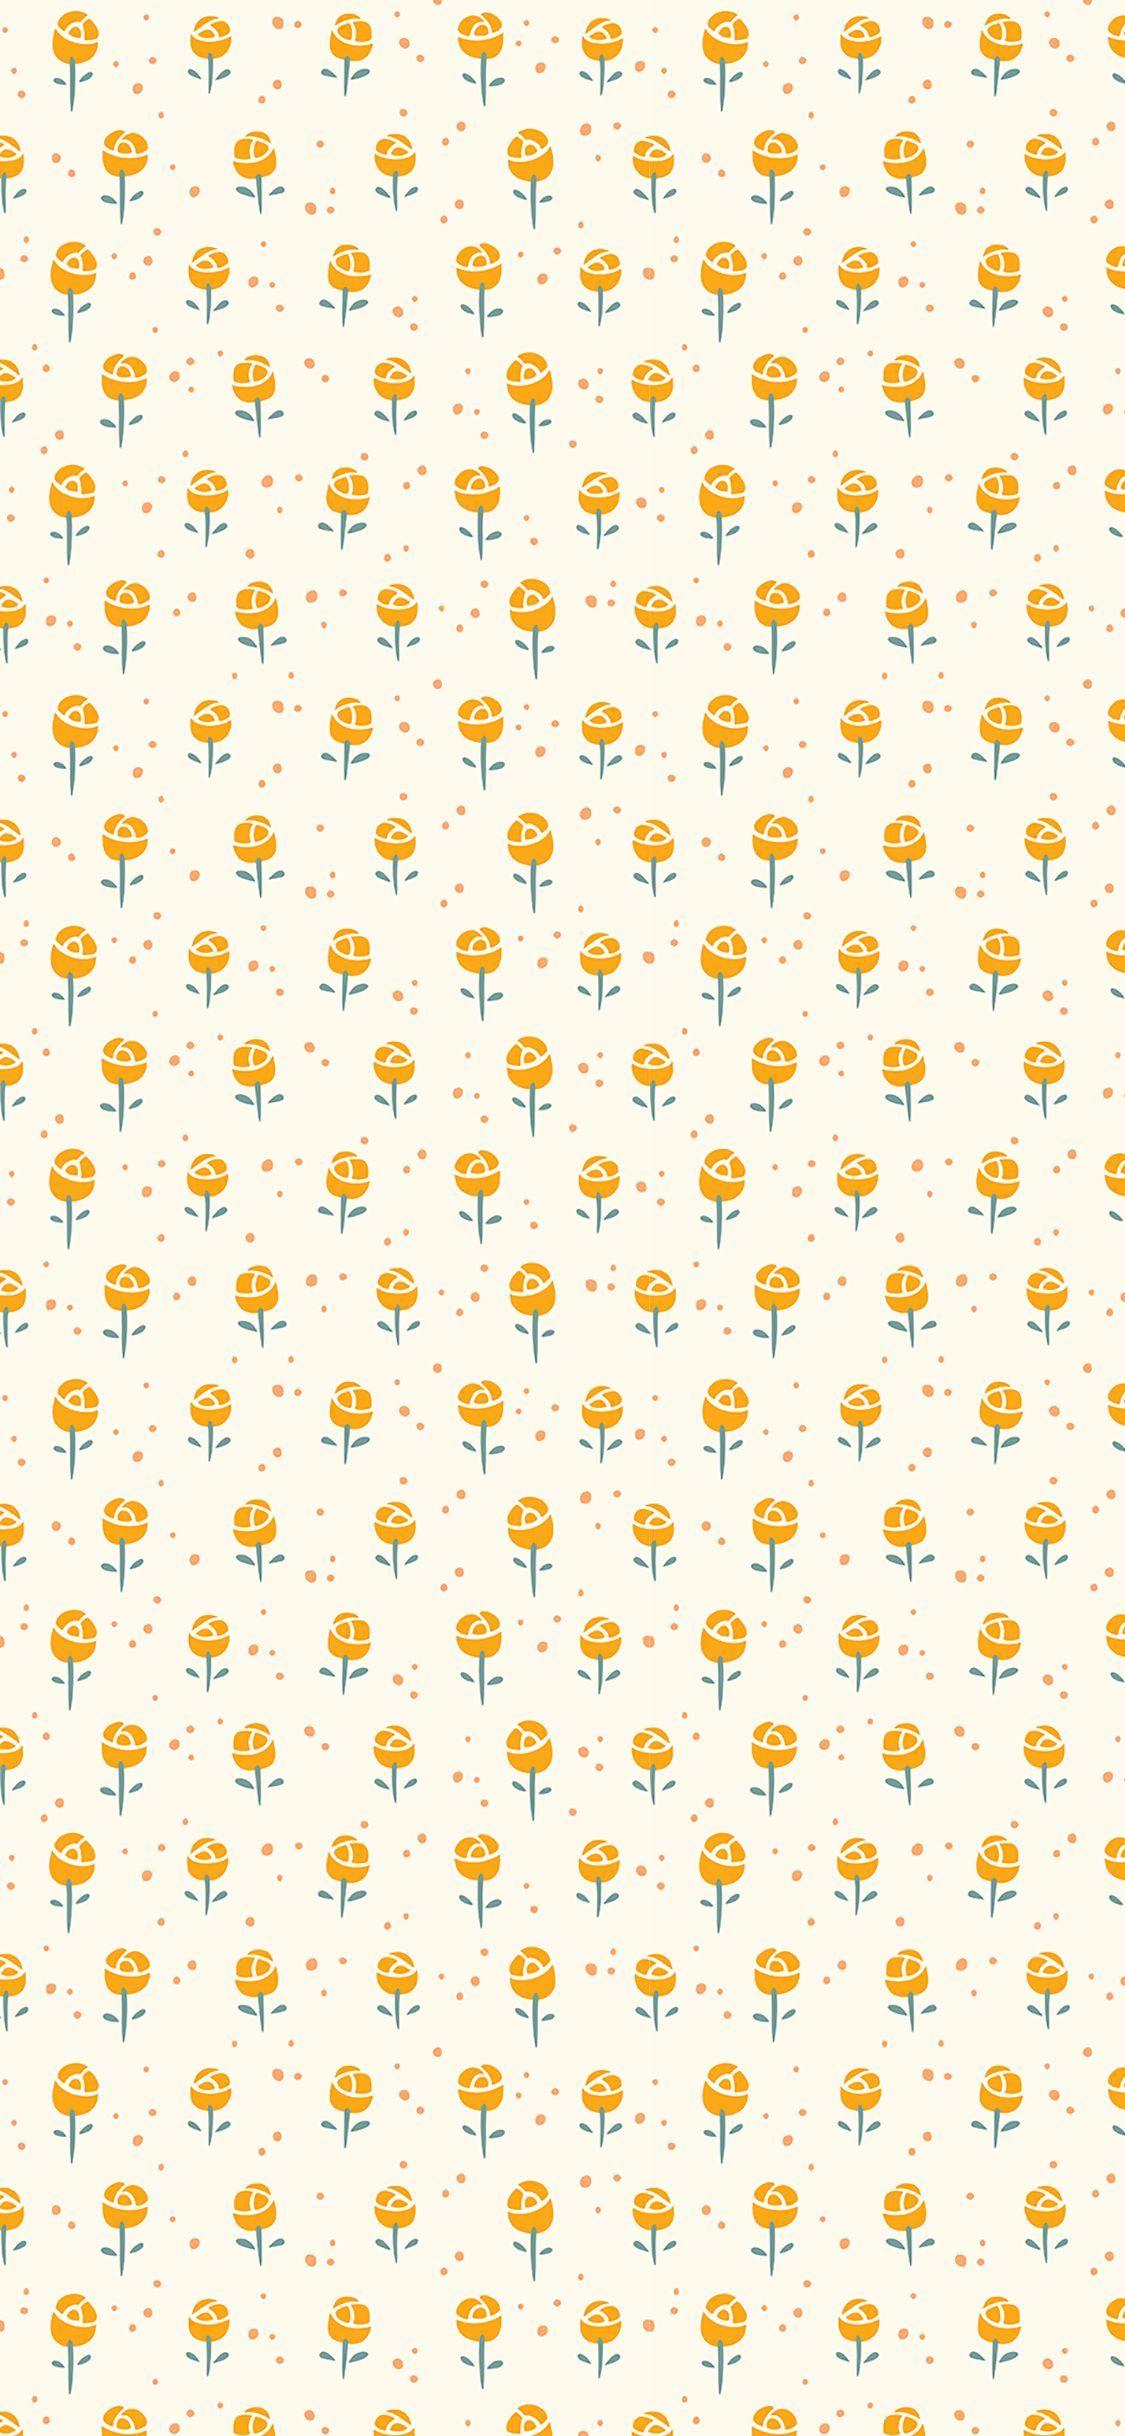 Cute Tablet Aesthetic Wallpapers Wallpaper Cave Aesthetics digital wallpaper, vaporwave, kanji, chinese characters. cute tablet aesthetic wallpapers